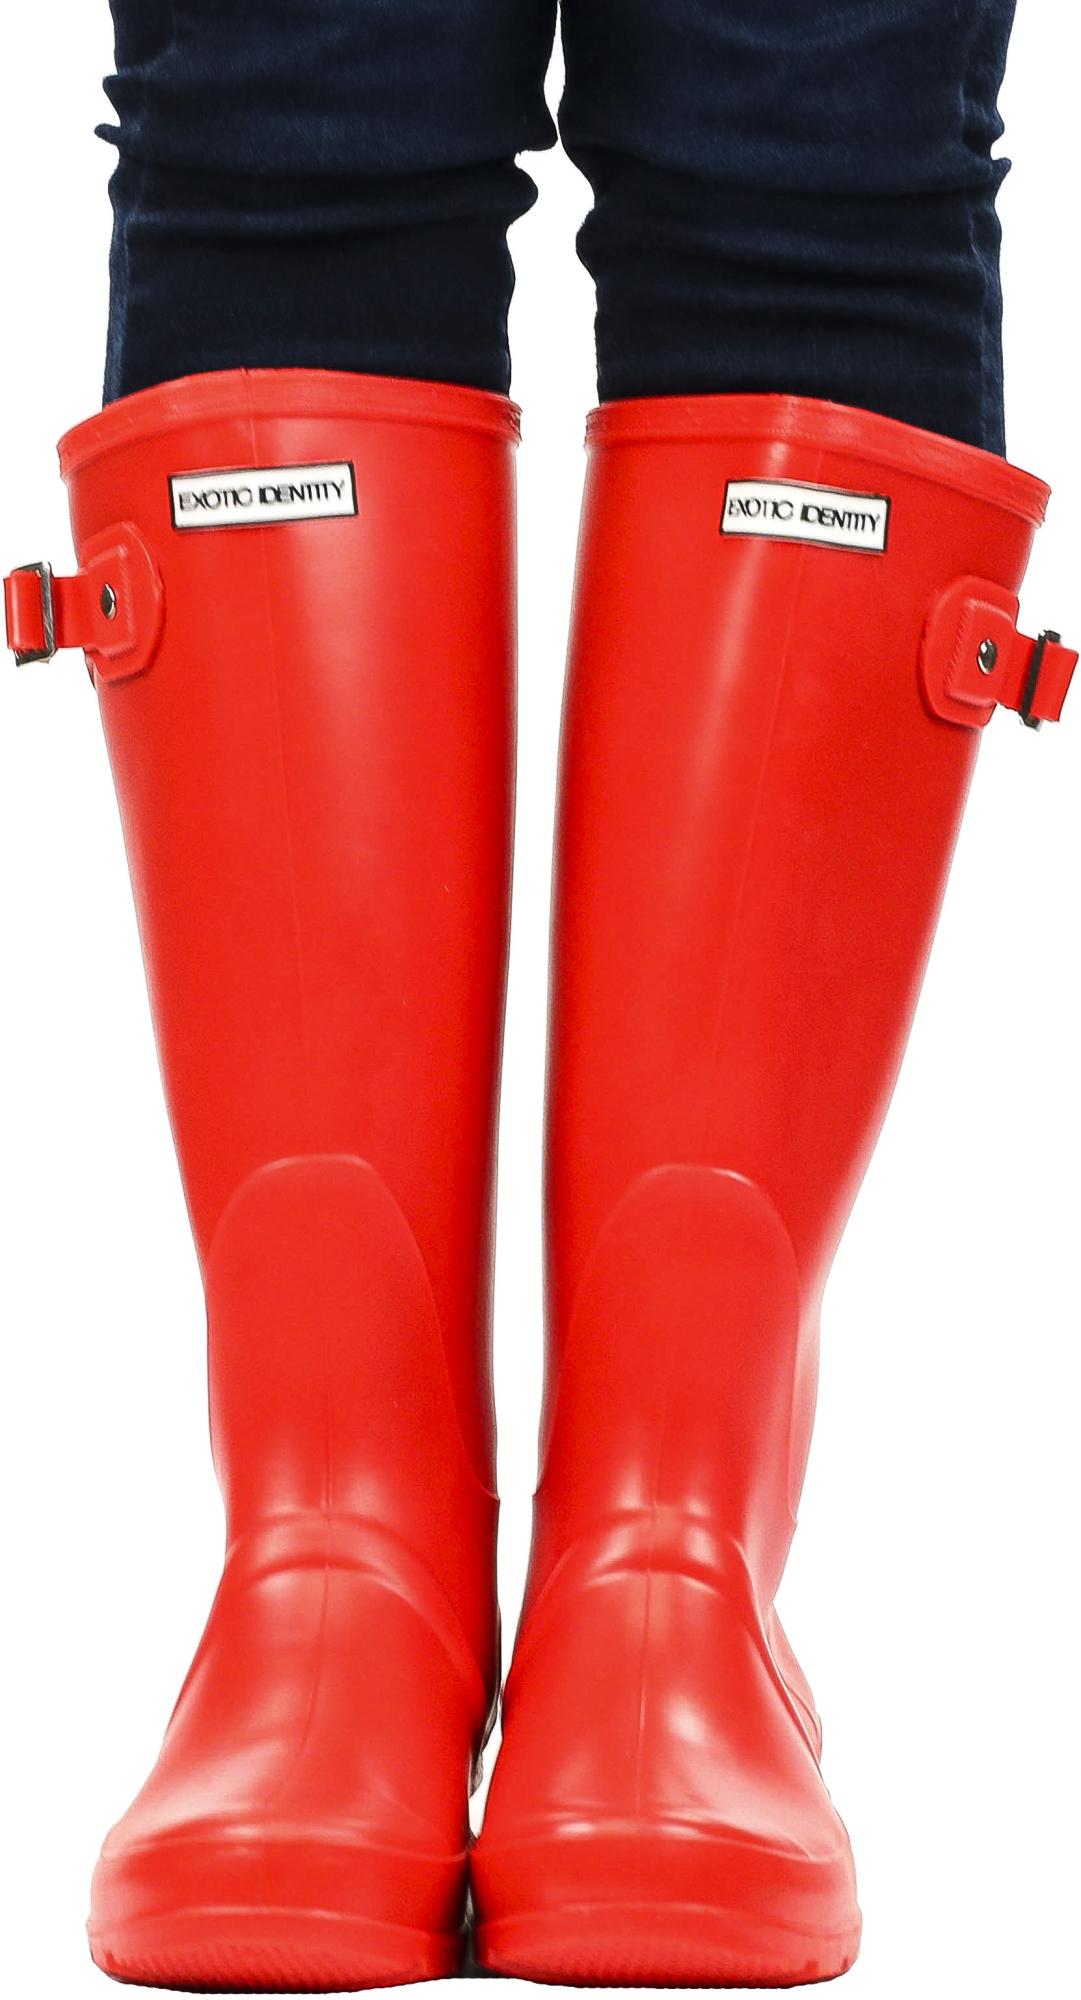 Exotic-Identity-Original-Tall-Rain-Boots-Waterproof-Premium-PVC-Nonslip-So thumbnail 36